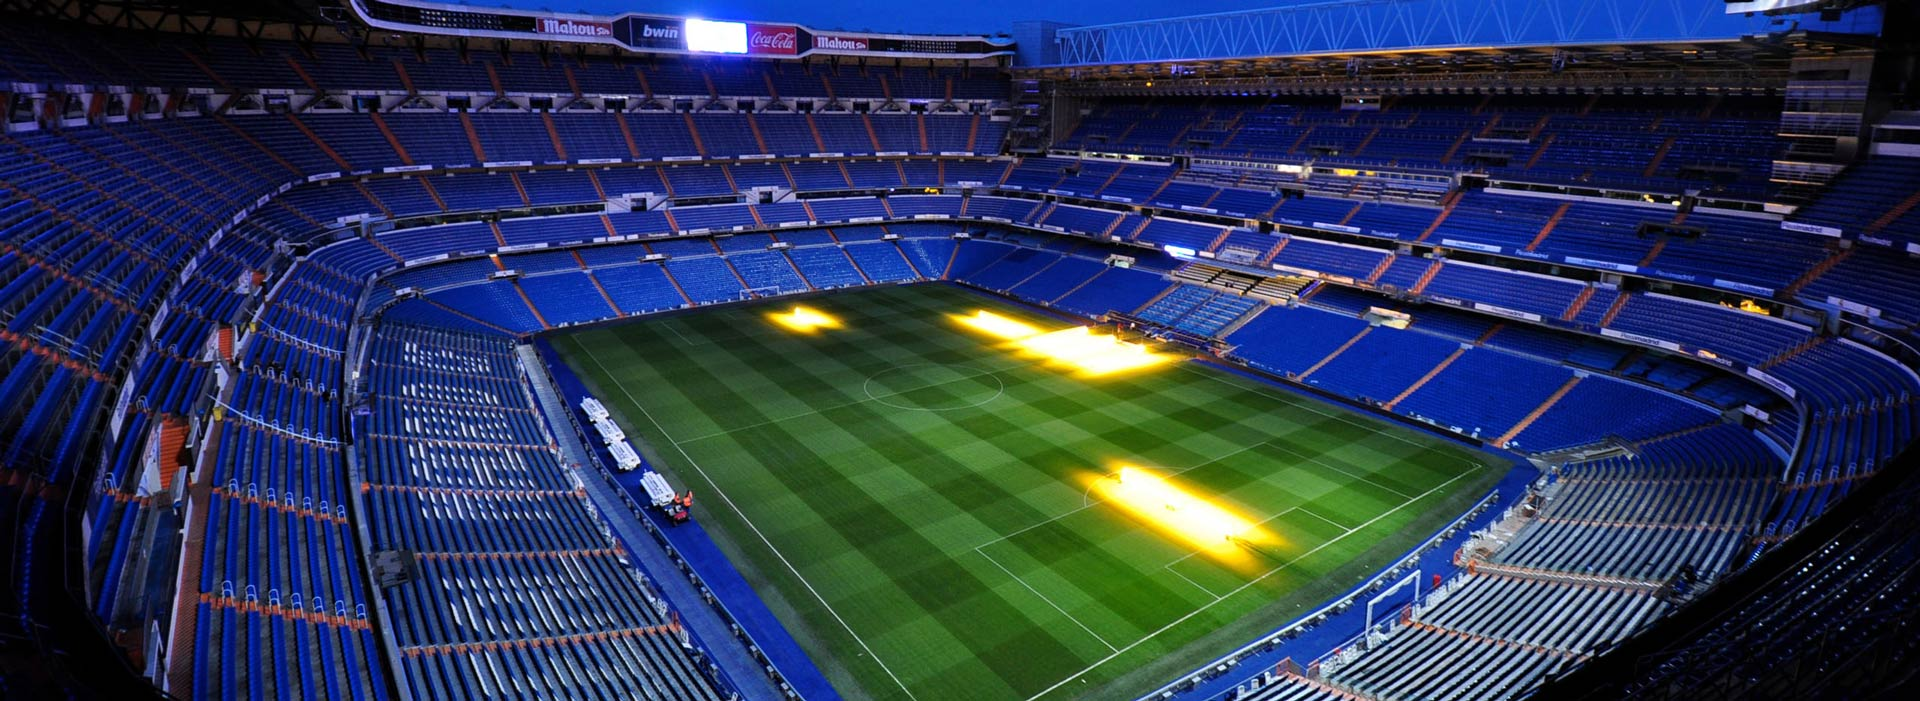 Visita Estadio Santiago Bernabu slo entrada  Europatours